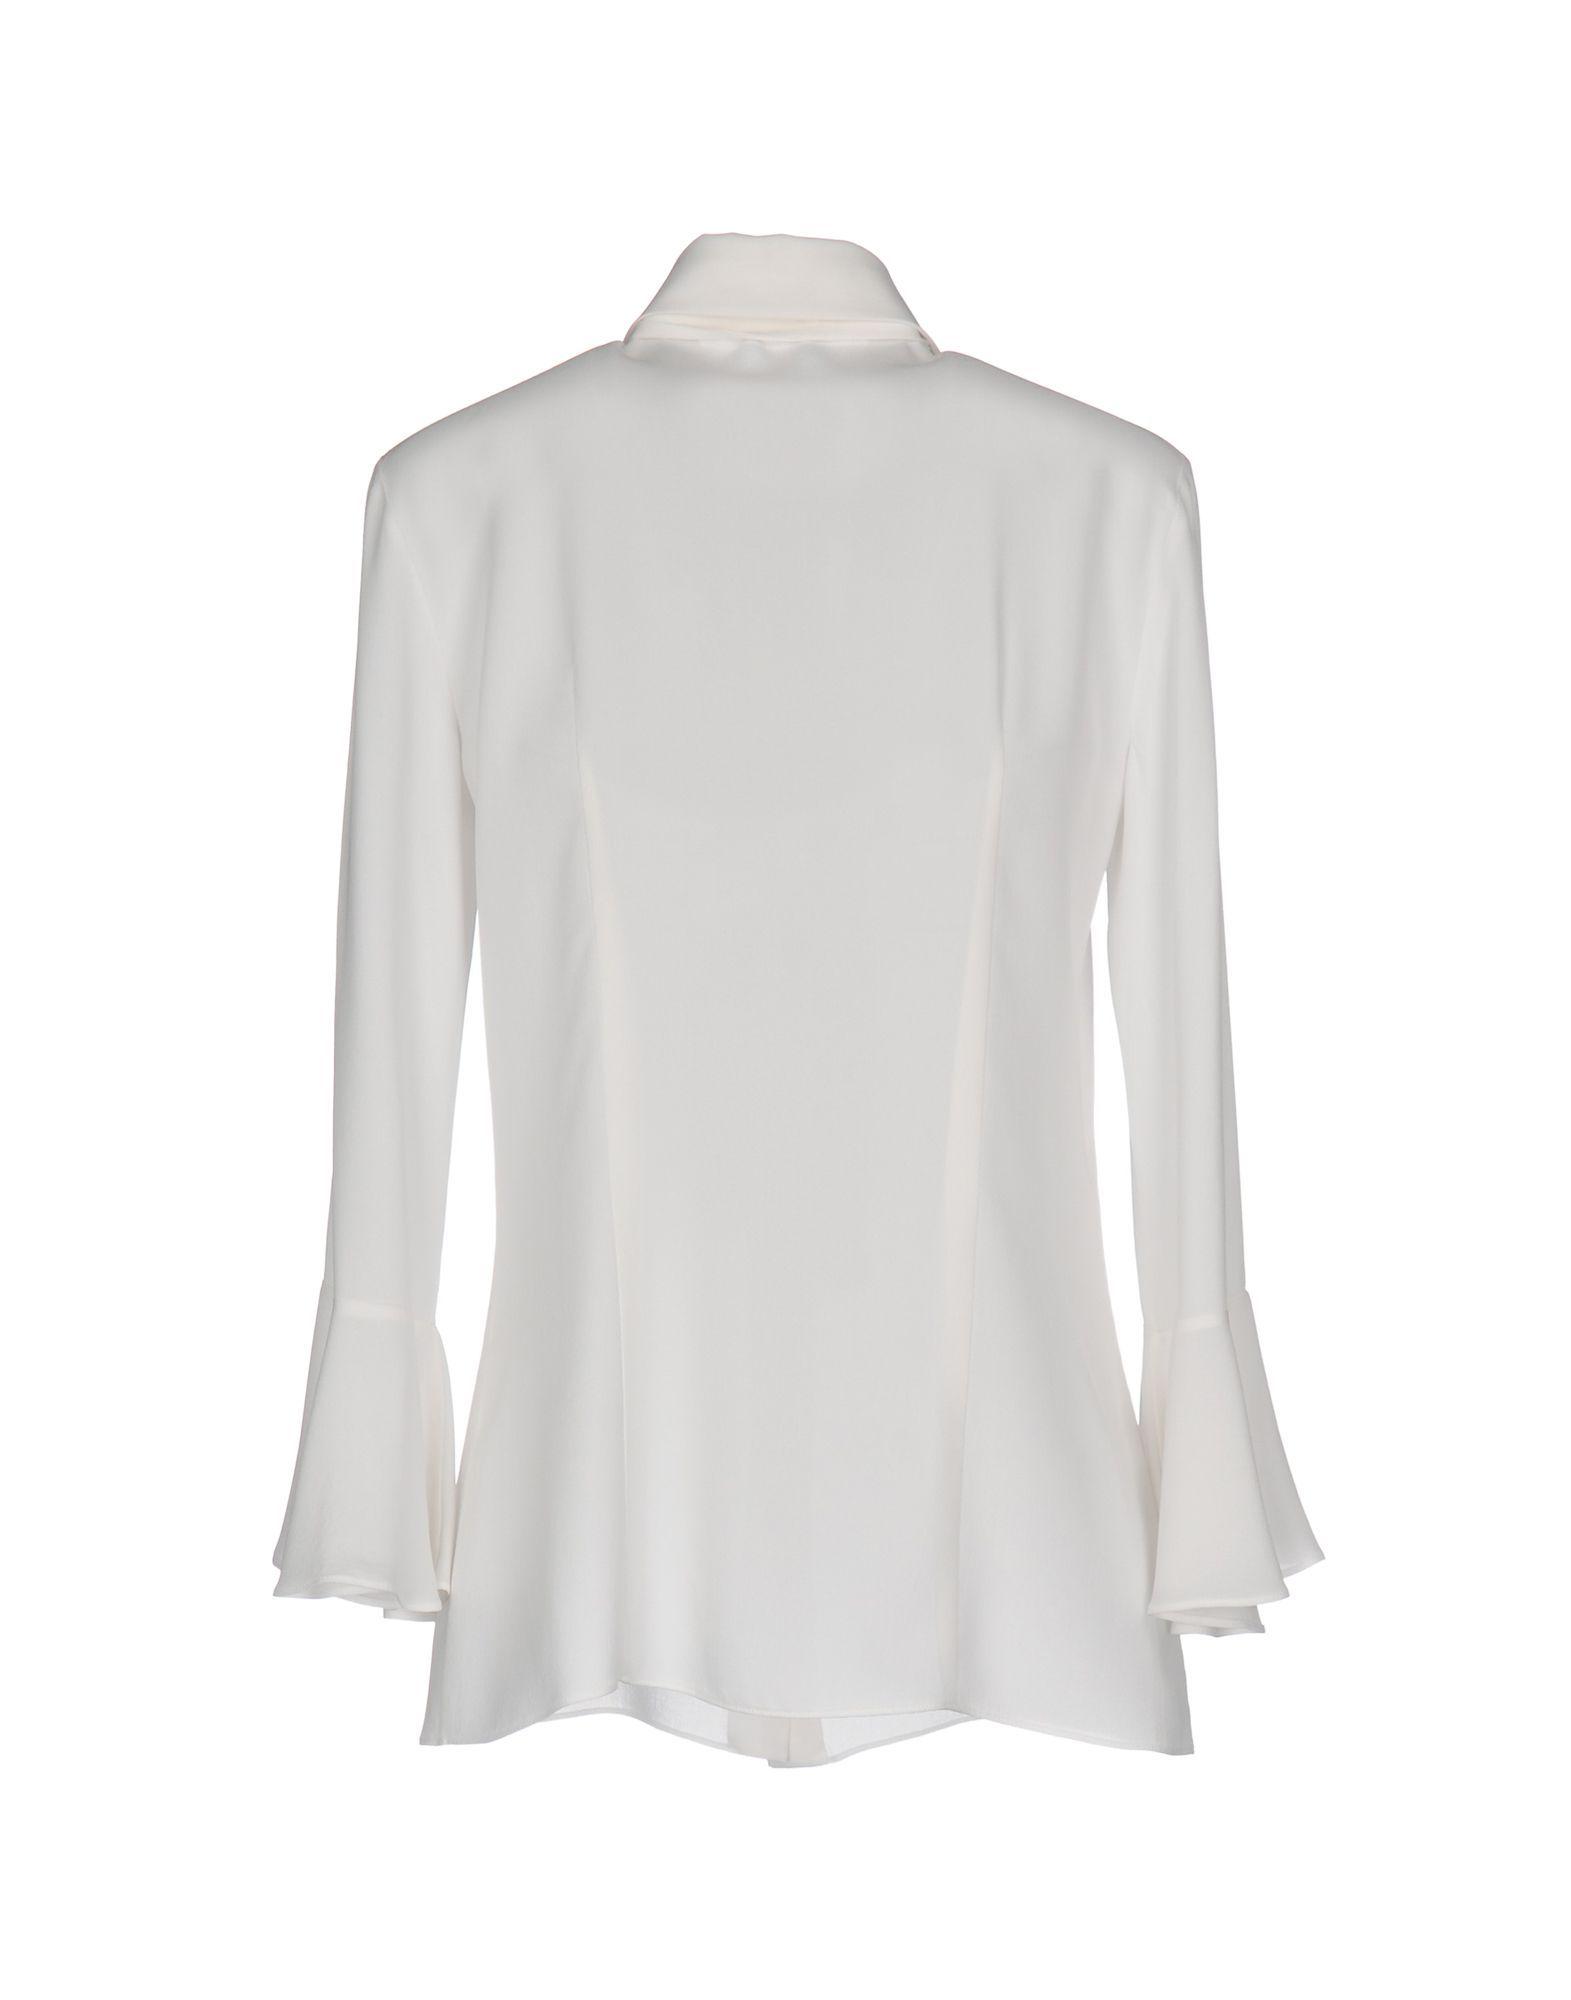 Shirts Michael Kors Collection Ivory Women's Silk